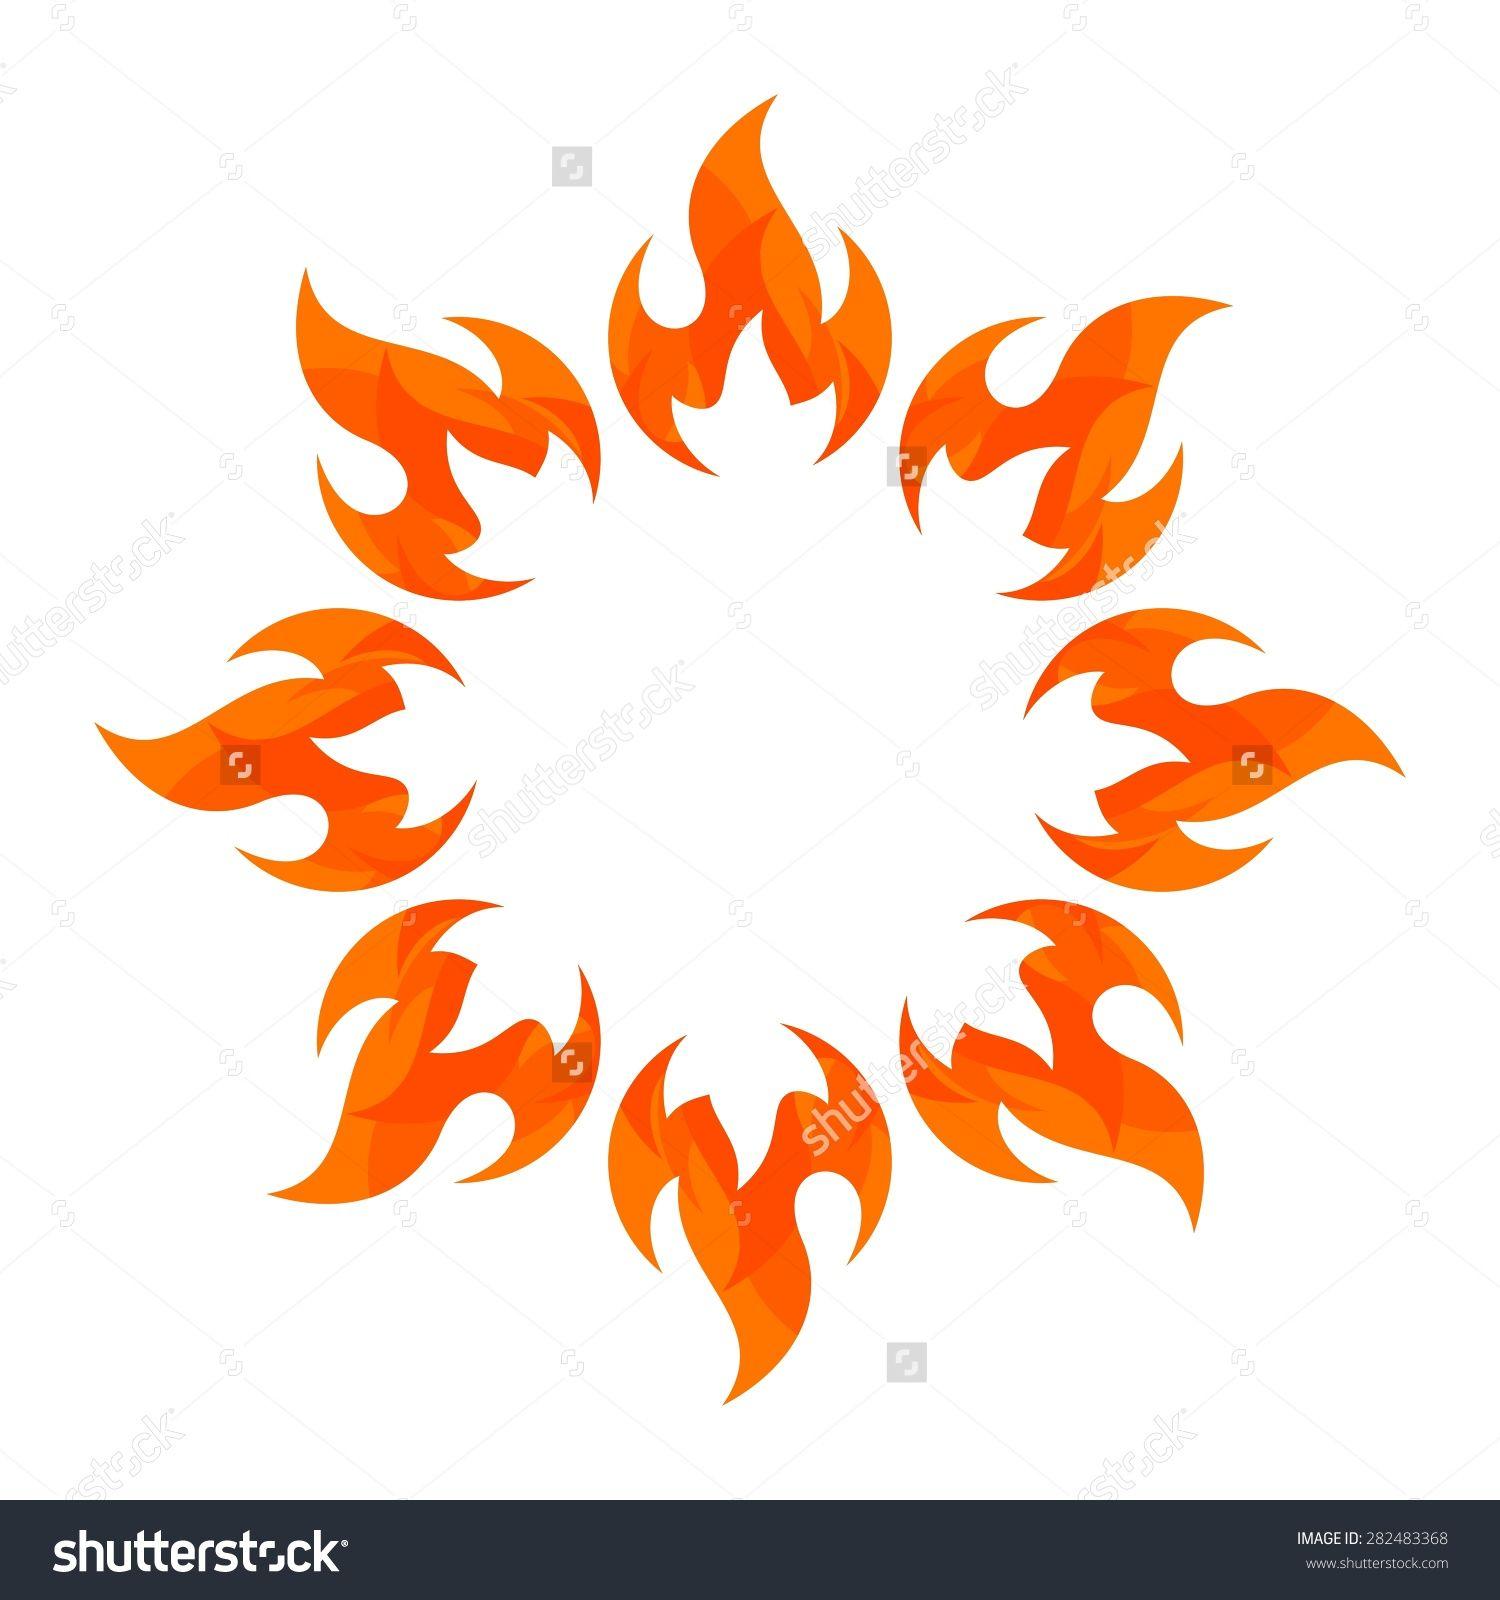 Fireball clipart flame design. Fire logo vector template